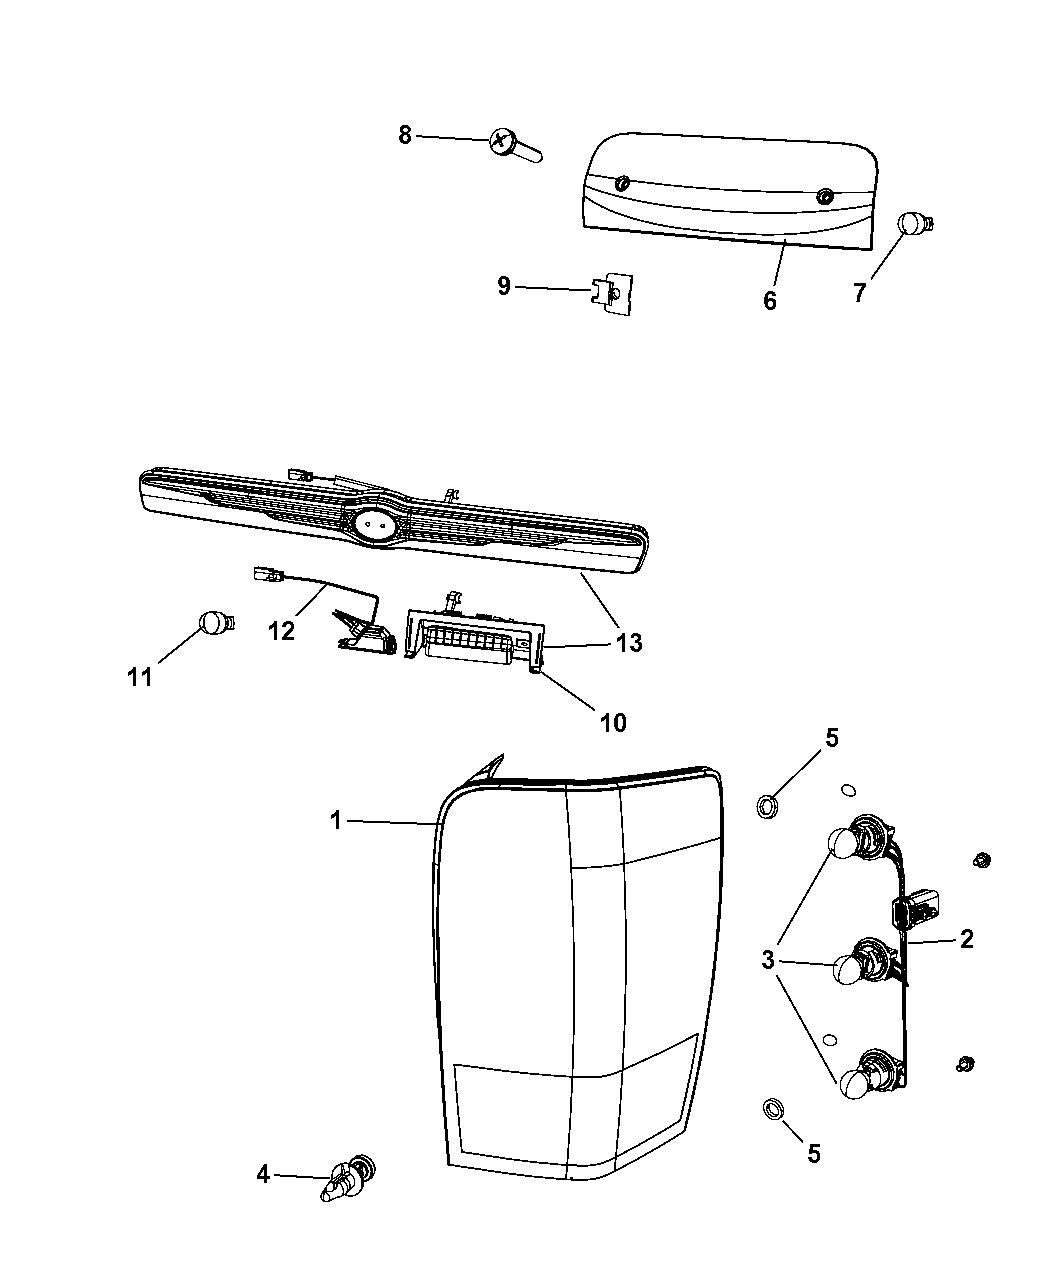 68001318ab genuine chrysler wiring taillamp. Black Bedroom Furniture Sets. Home Design Ideas